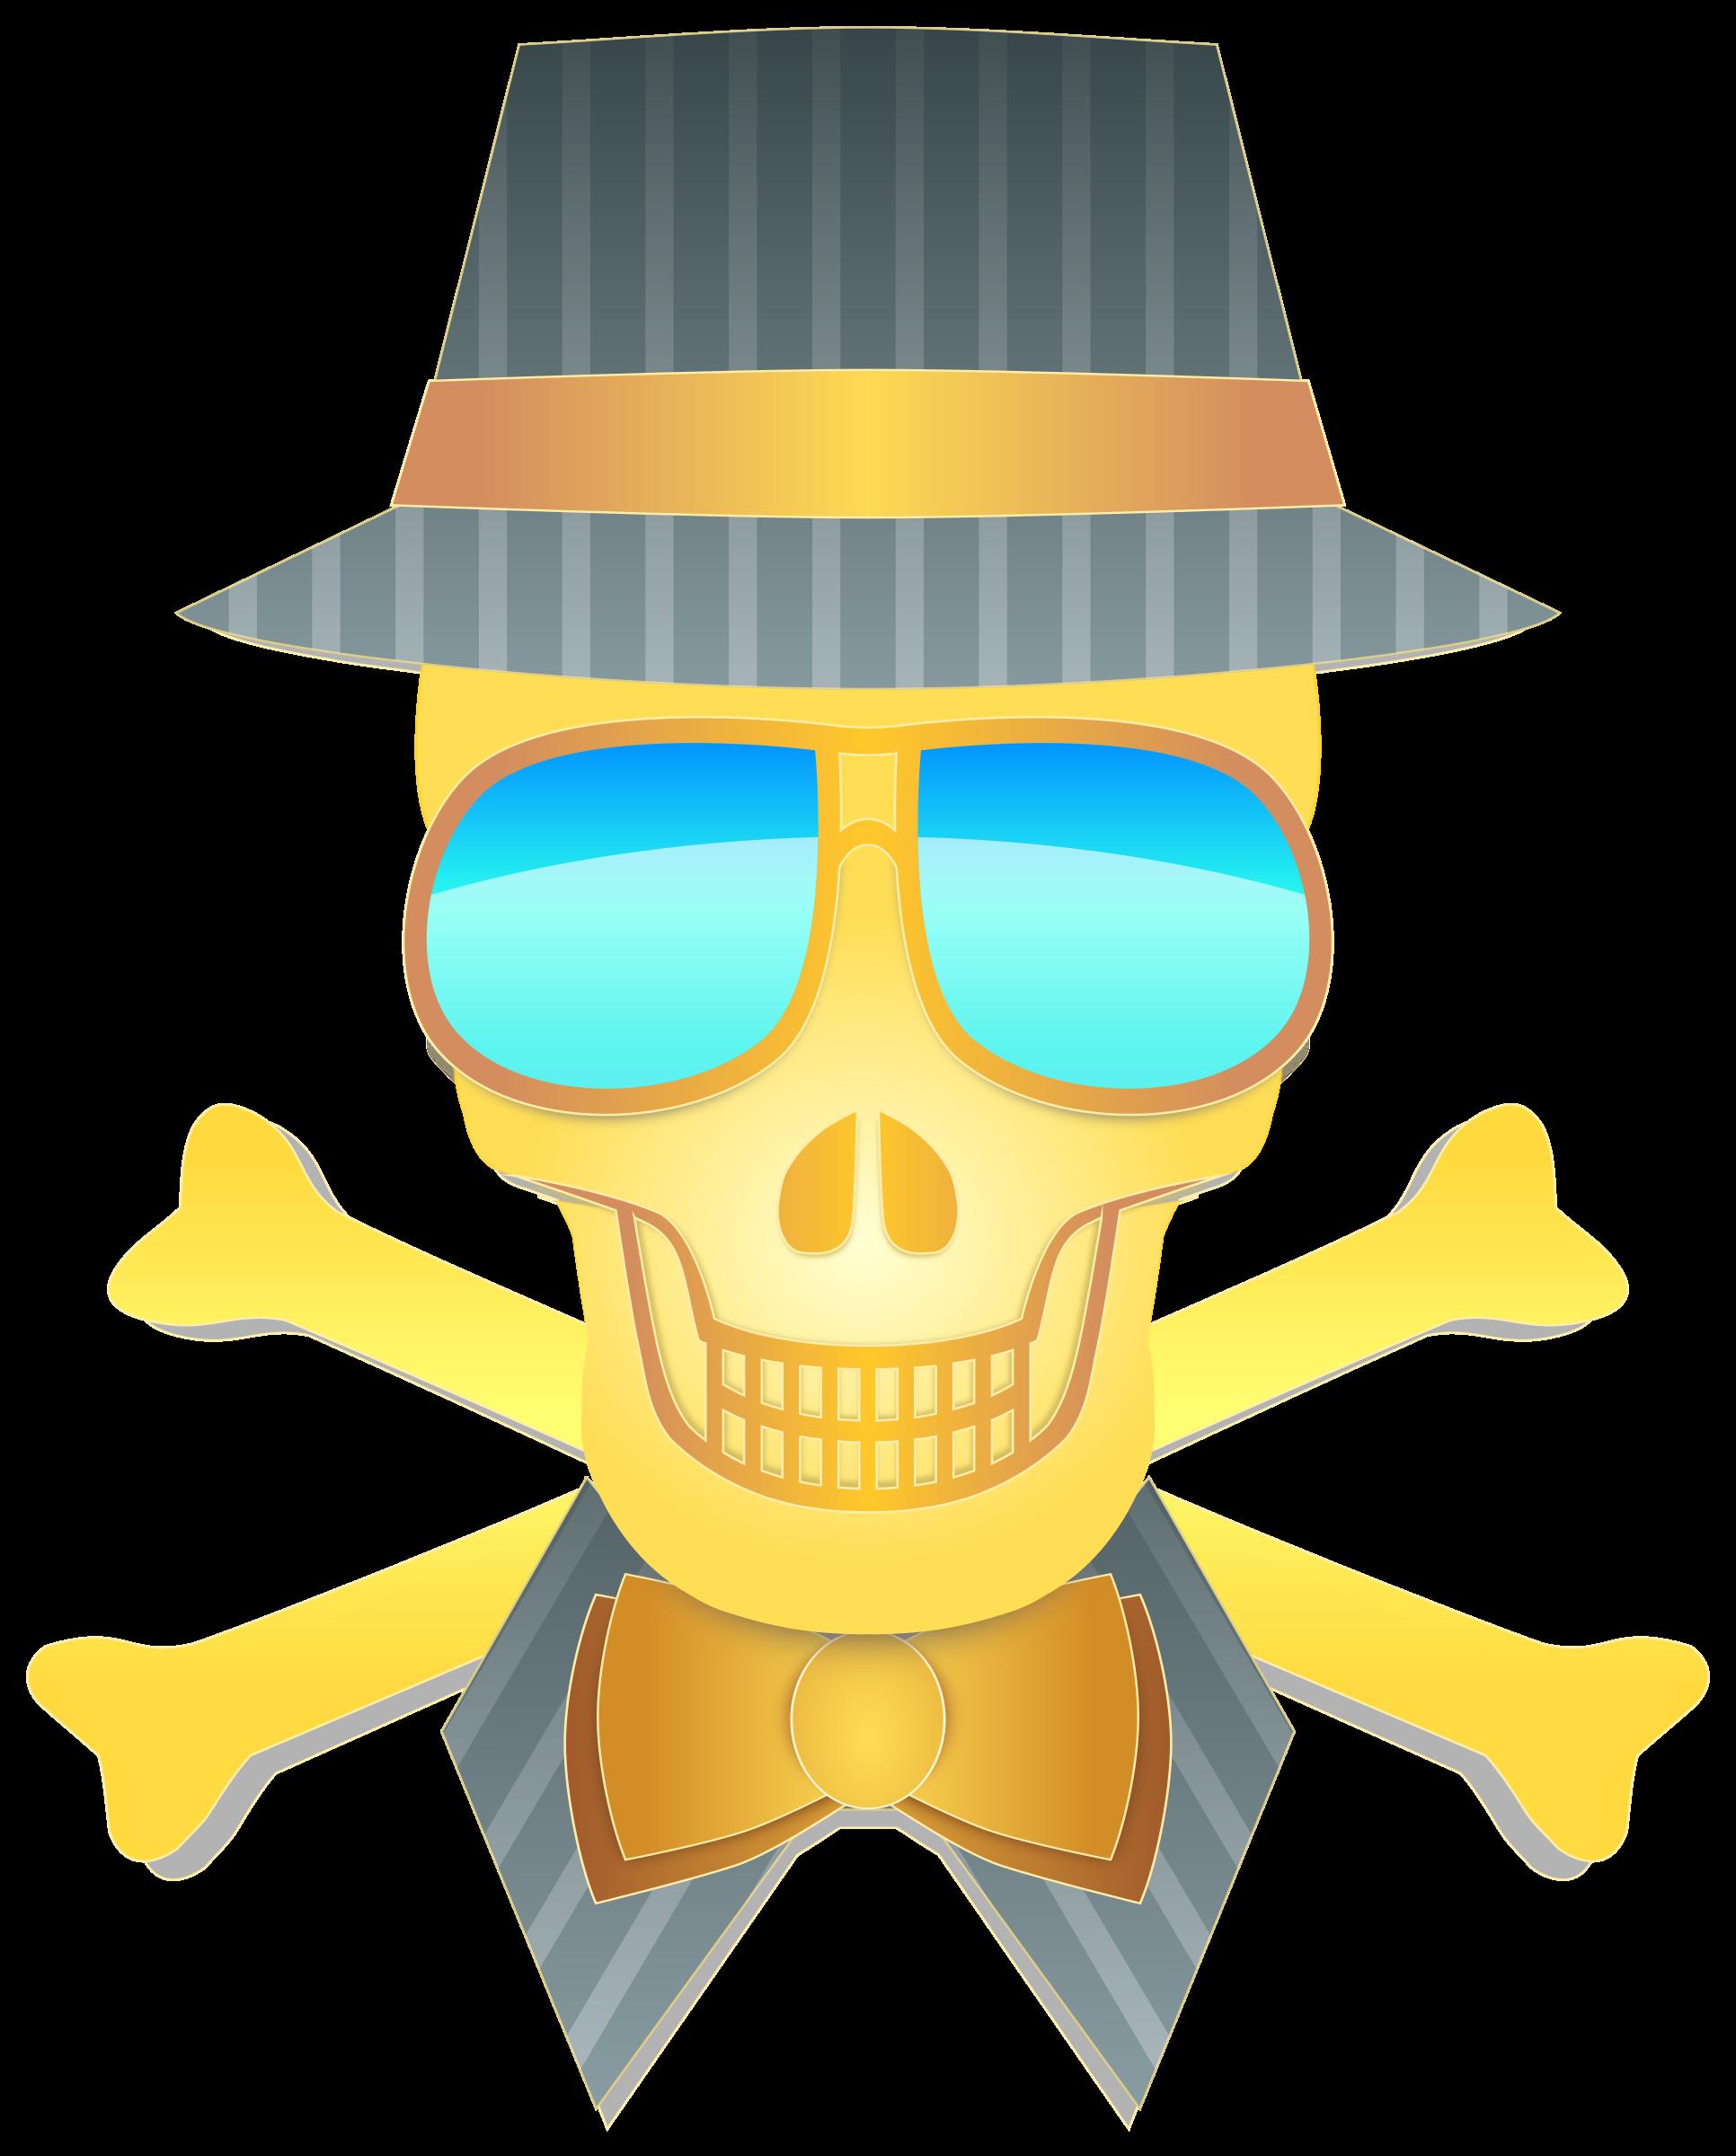 Skull and crossbones with sun glasses clipart svg black and white Clipart - Dapper Skull svg black and white